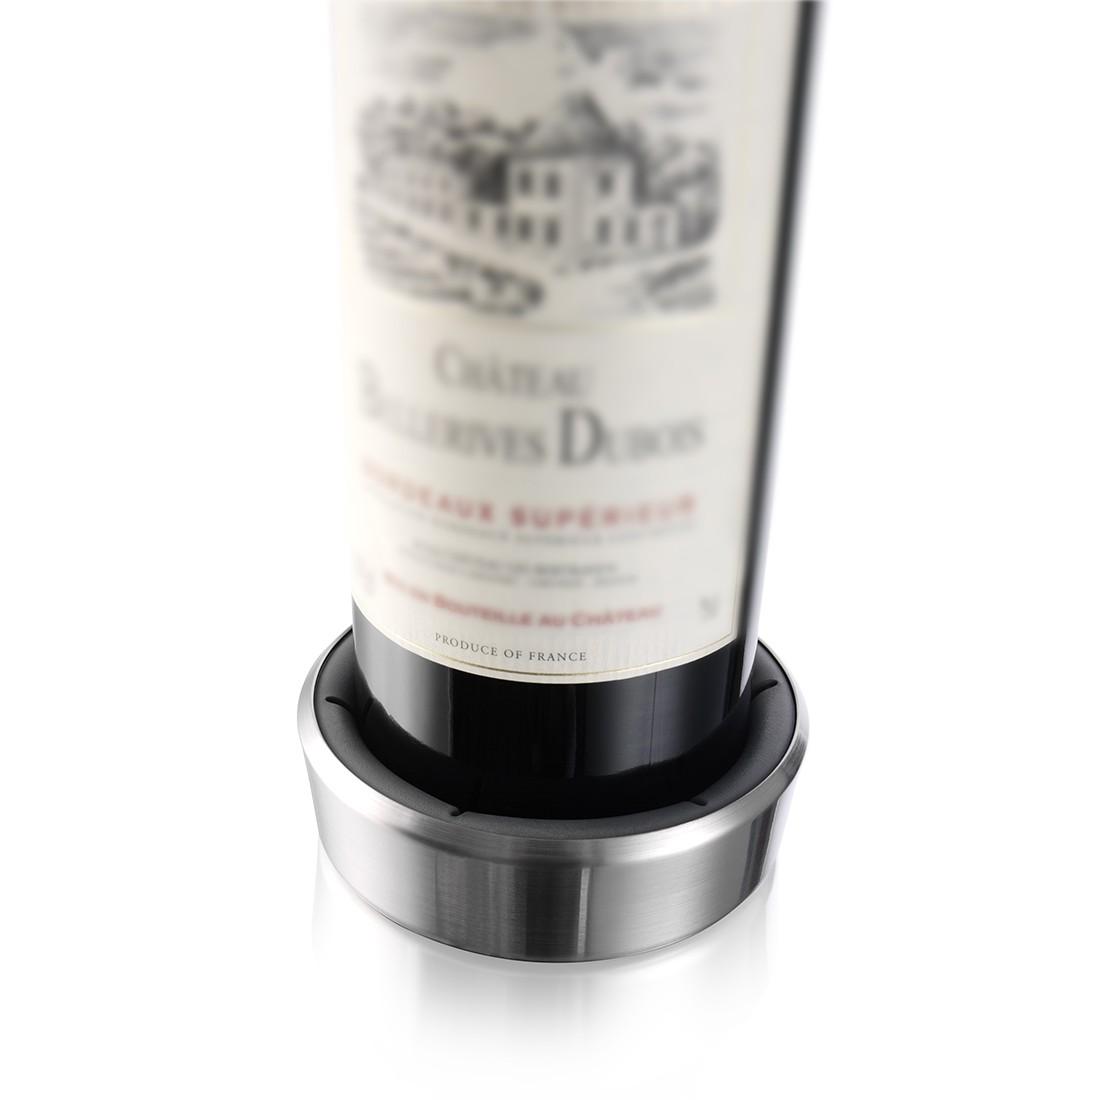 Flaschenuntersetzer (3er-Set) – Edelstahl, Vacu Vin günstig